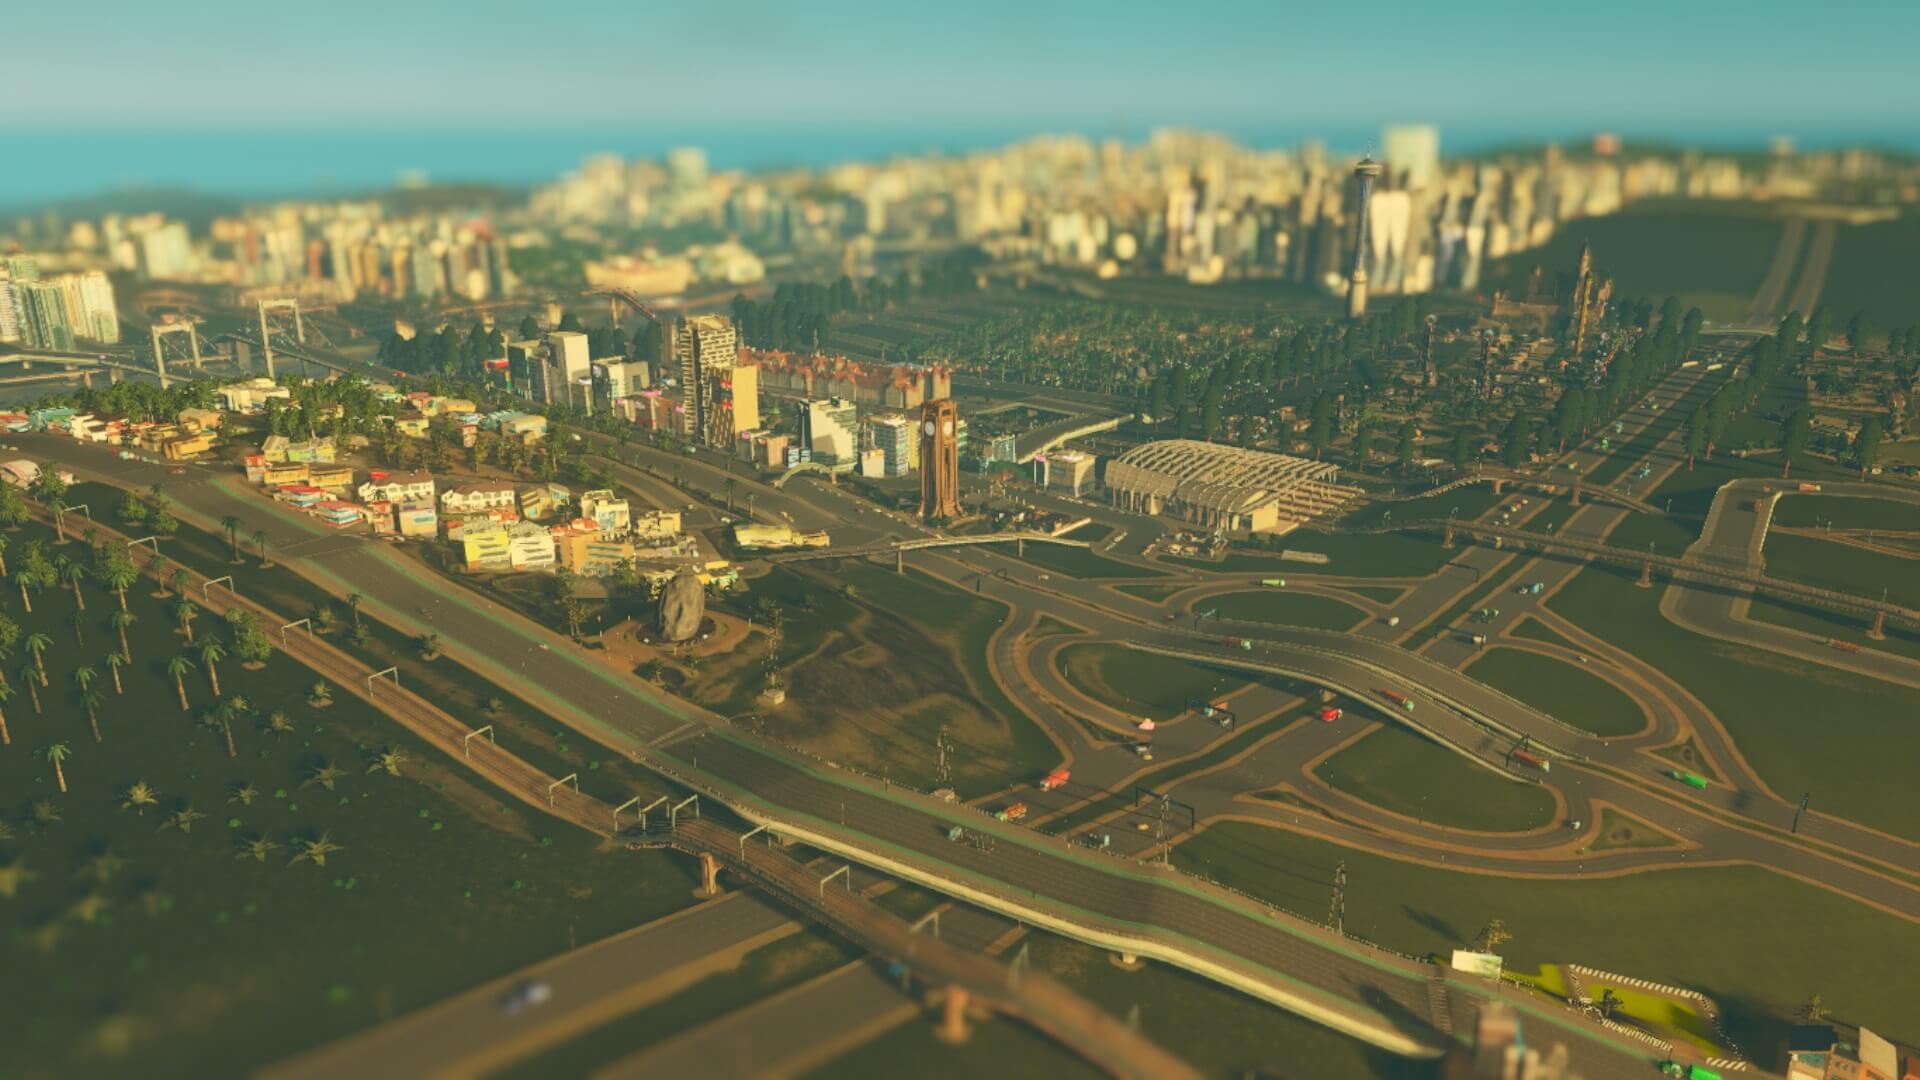 cities-skylines-cargo08 【Cities:skylines攻略ブログ】 渋滞しない貨物港駅・貨物ハブの作り方 Cities:Skylines(シティーズ:スカイライン ) 街作りシミュレーションゲーム